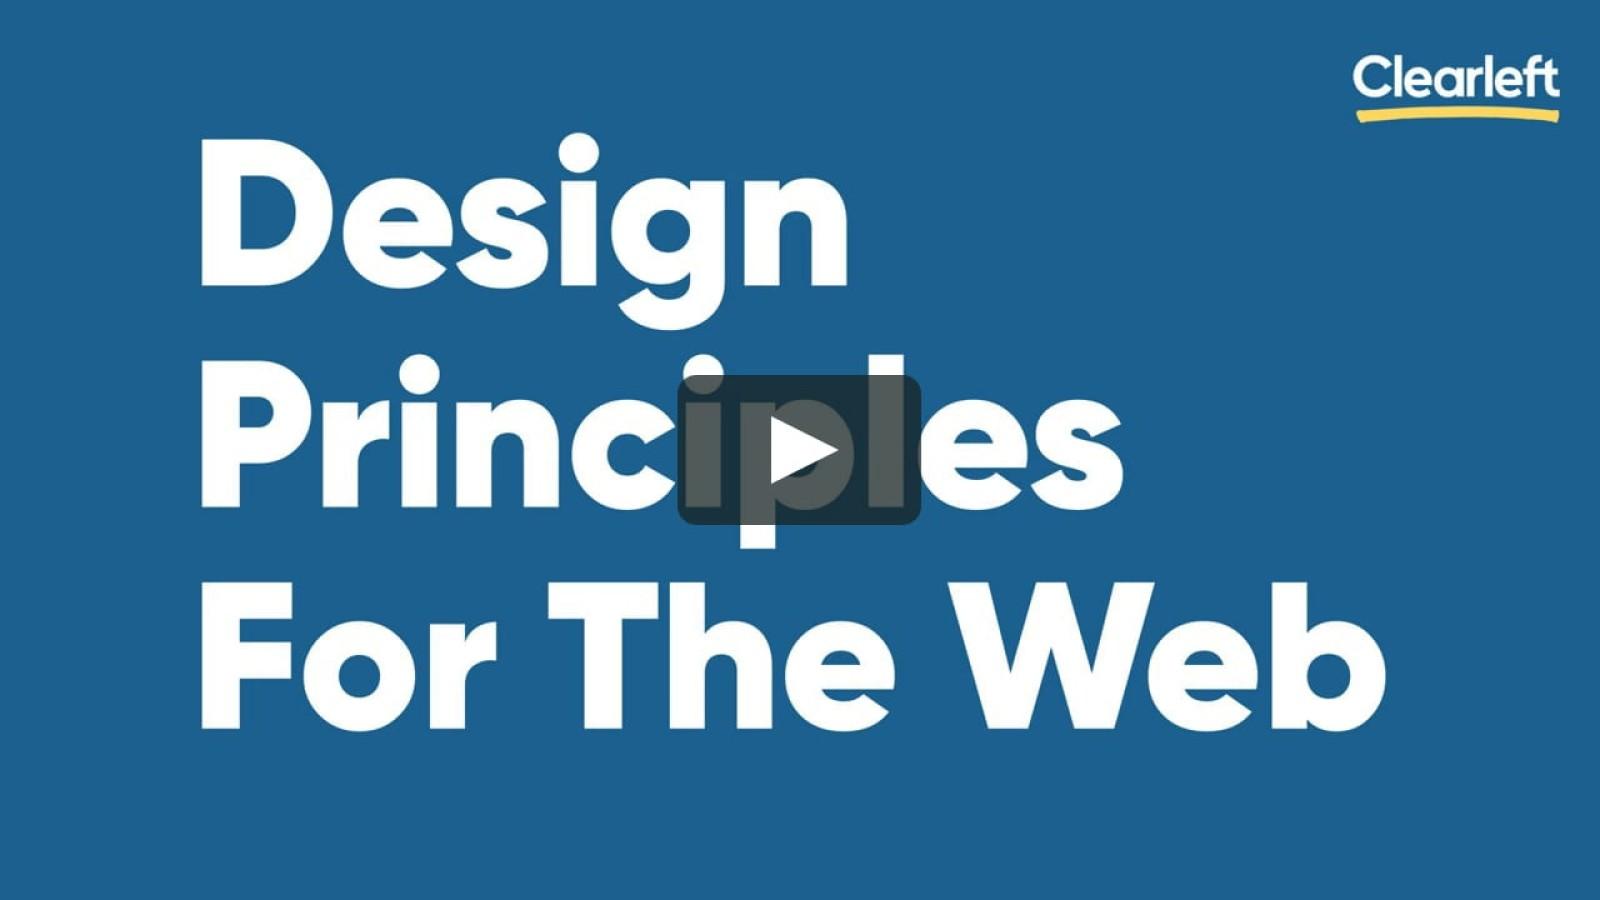 Design Principles For The Web